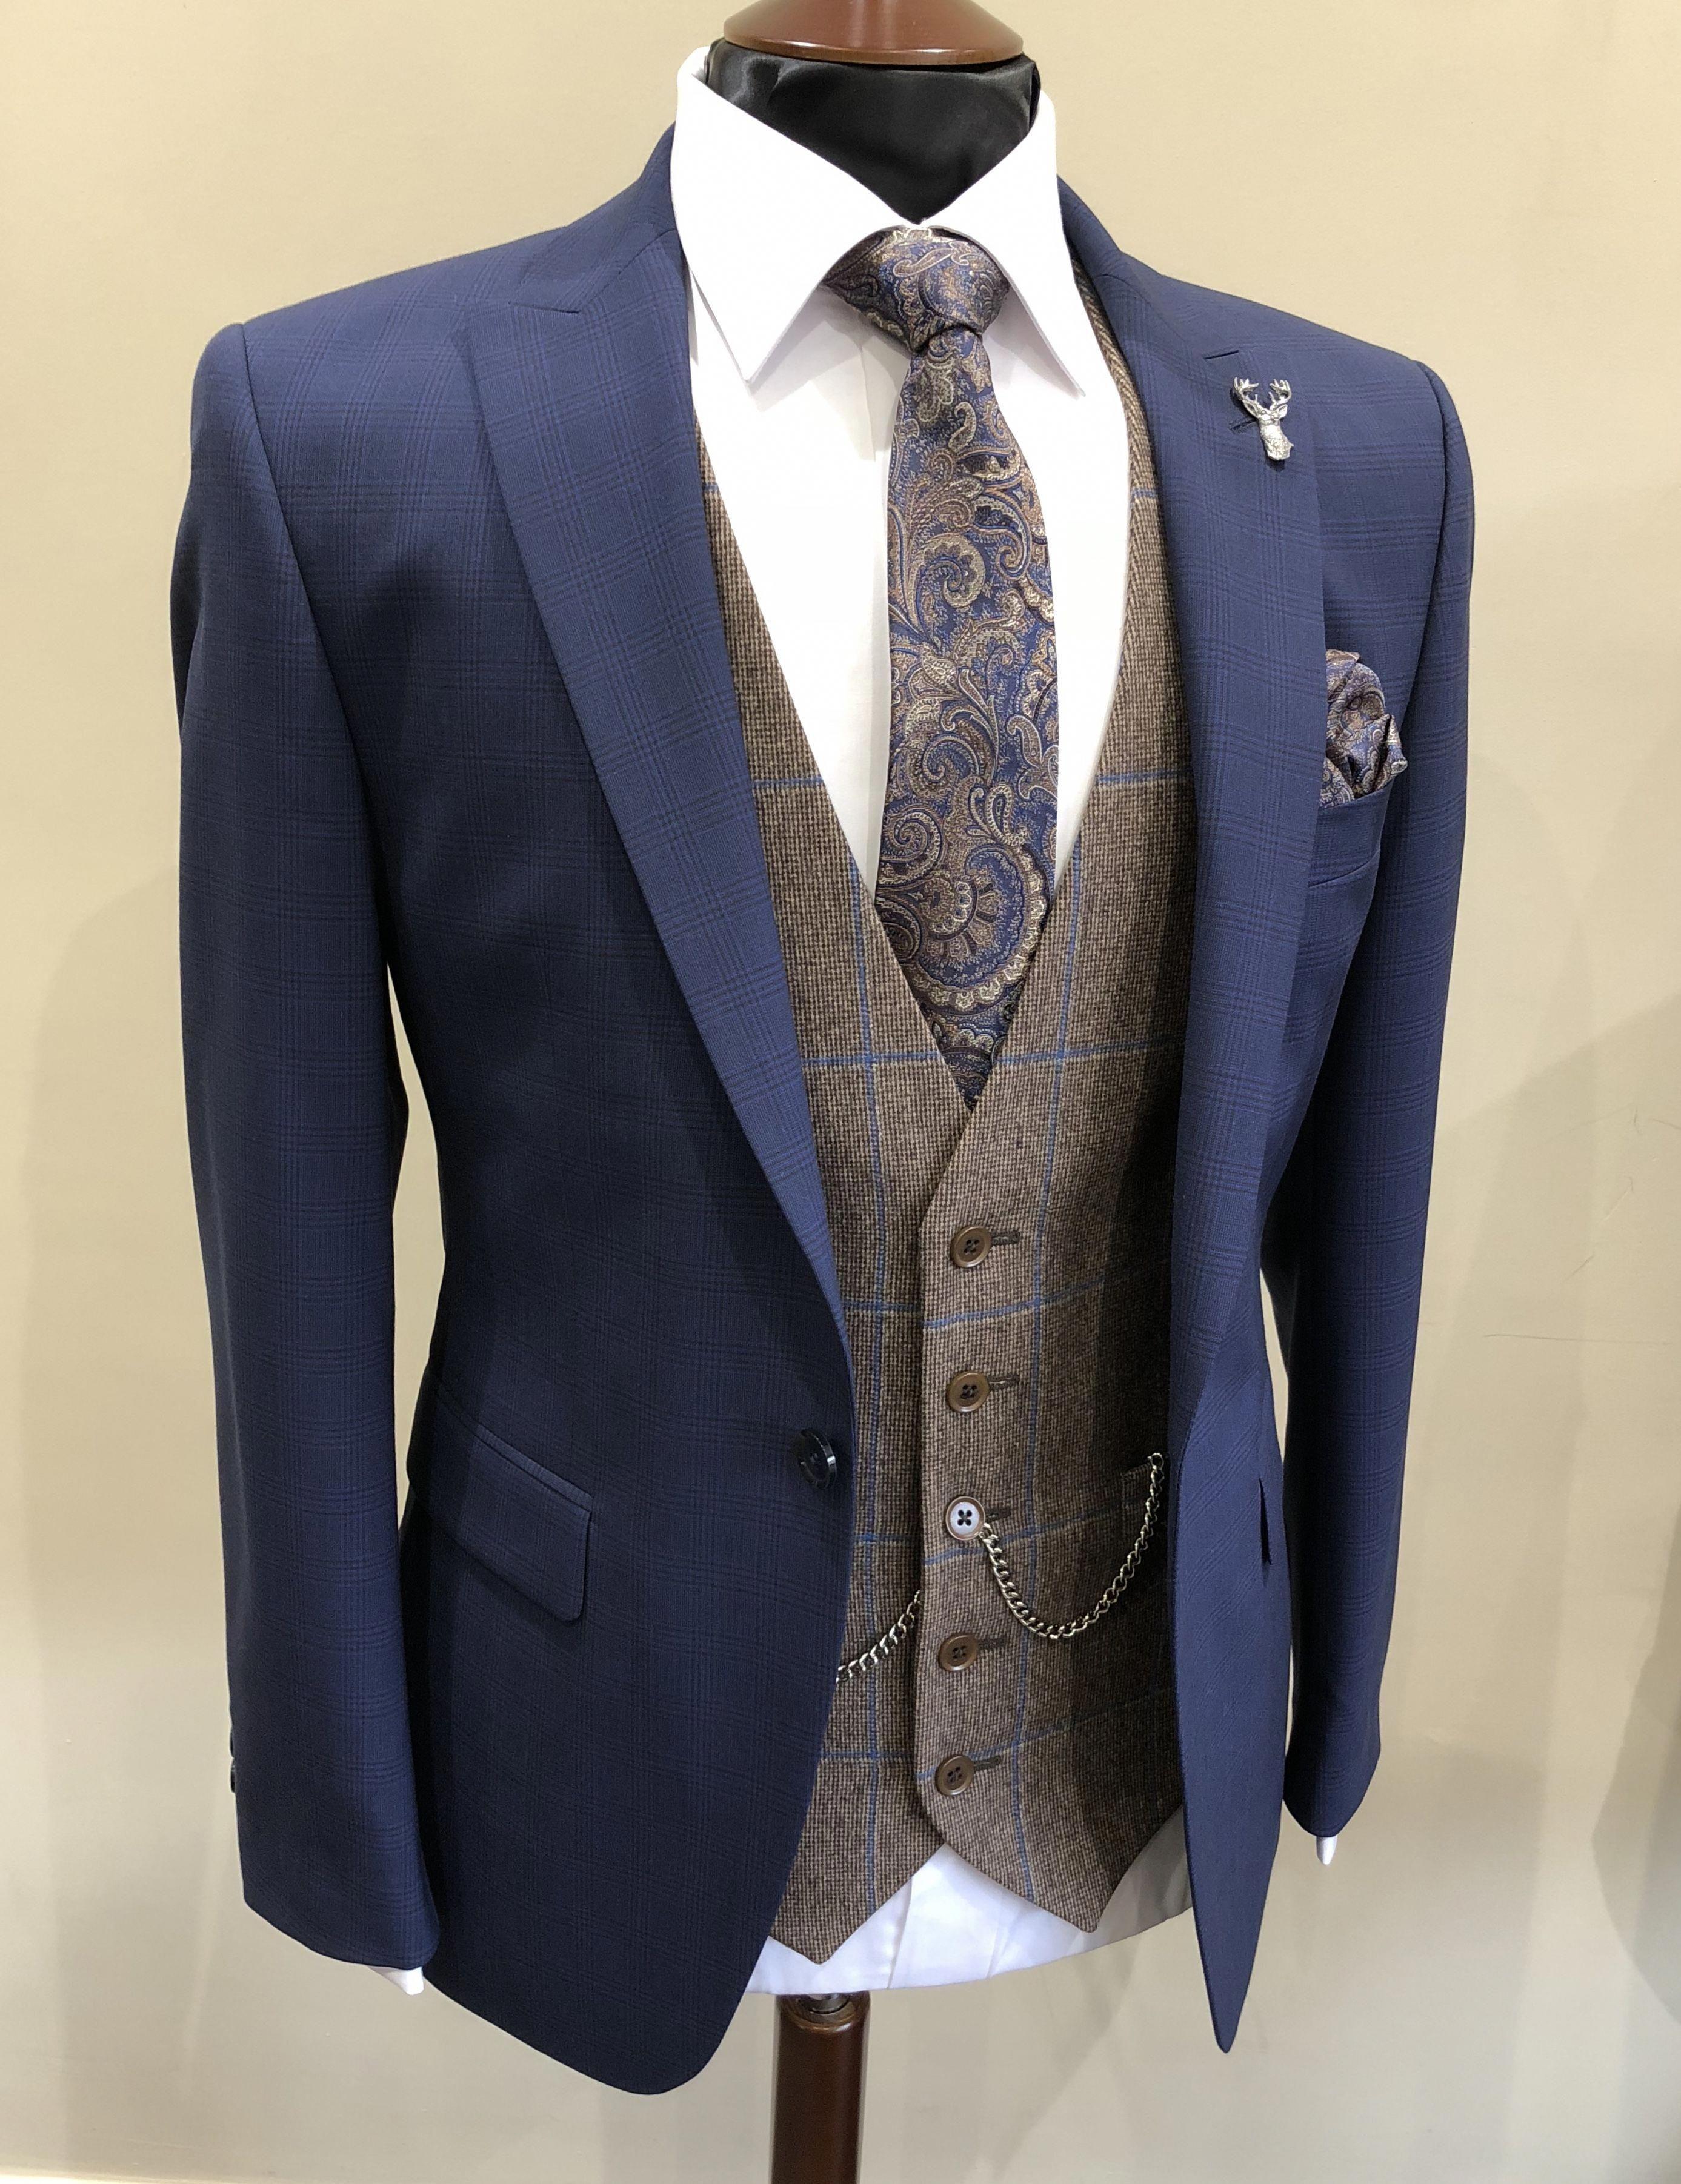 Fashion Men And Women S Fashion Wedding Suit Hire Wedding Suits Groom Mens Wedding Attire